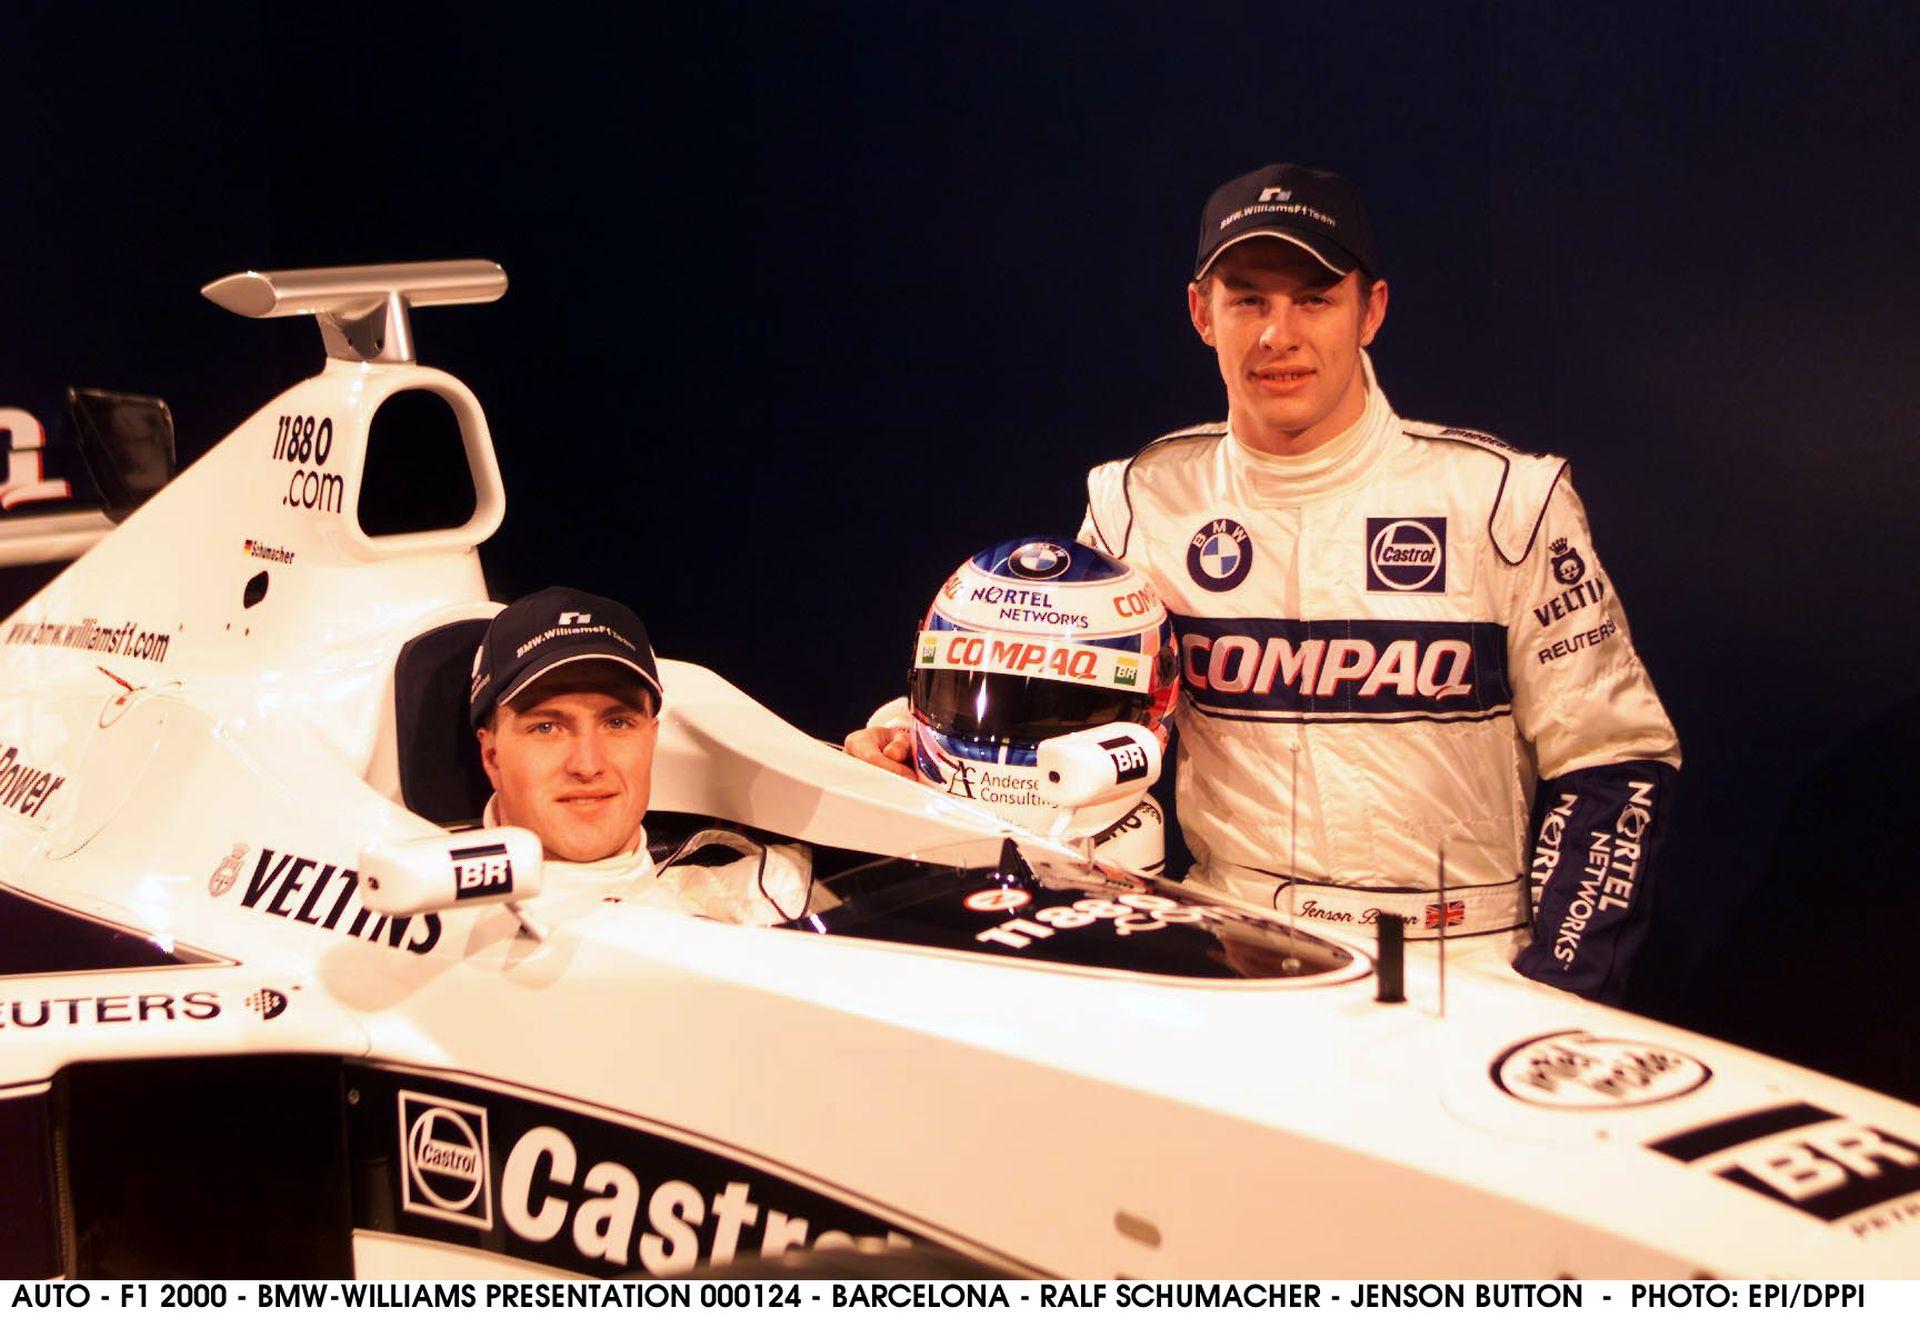 2000-ben ezen a napon jelentette be a Williams Button szerződtetését